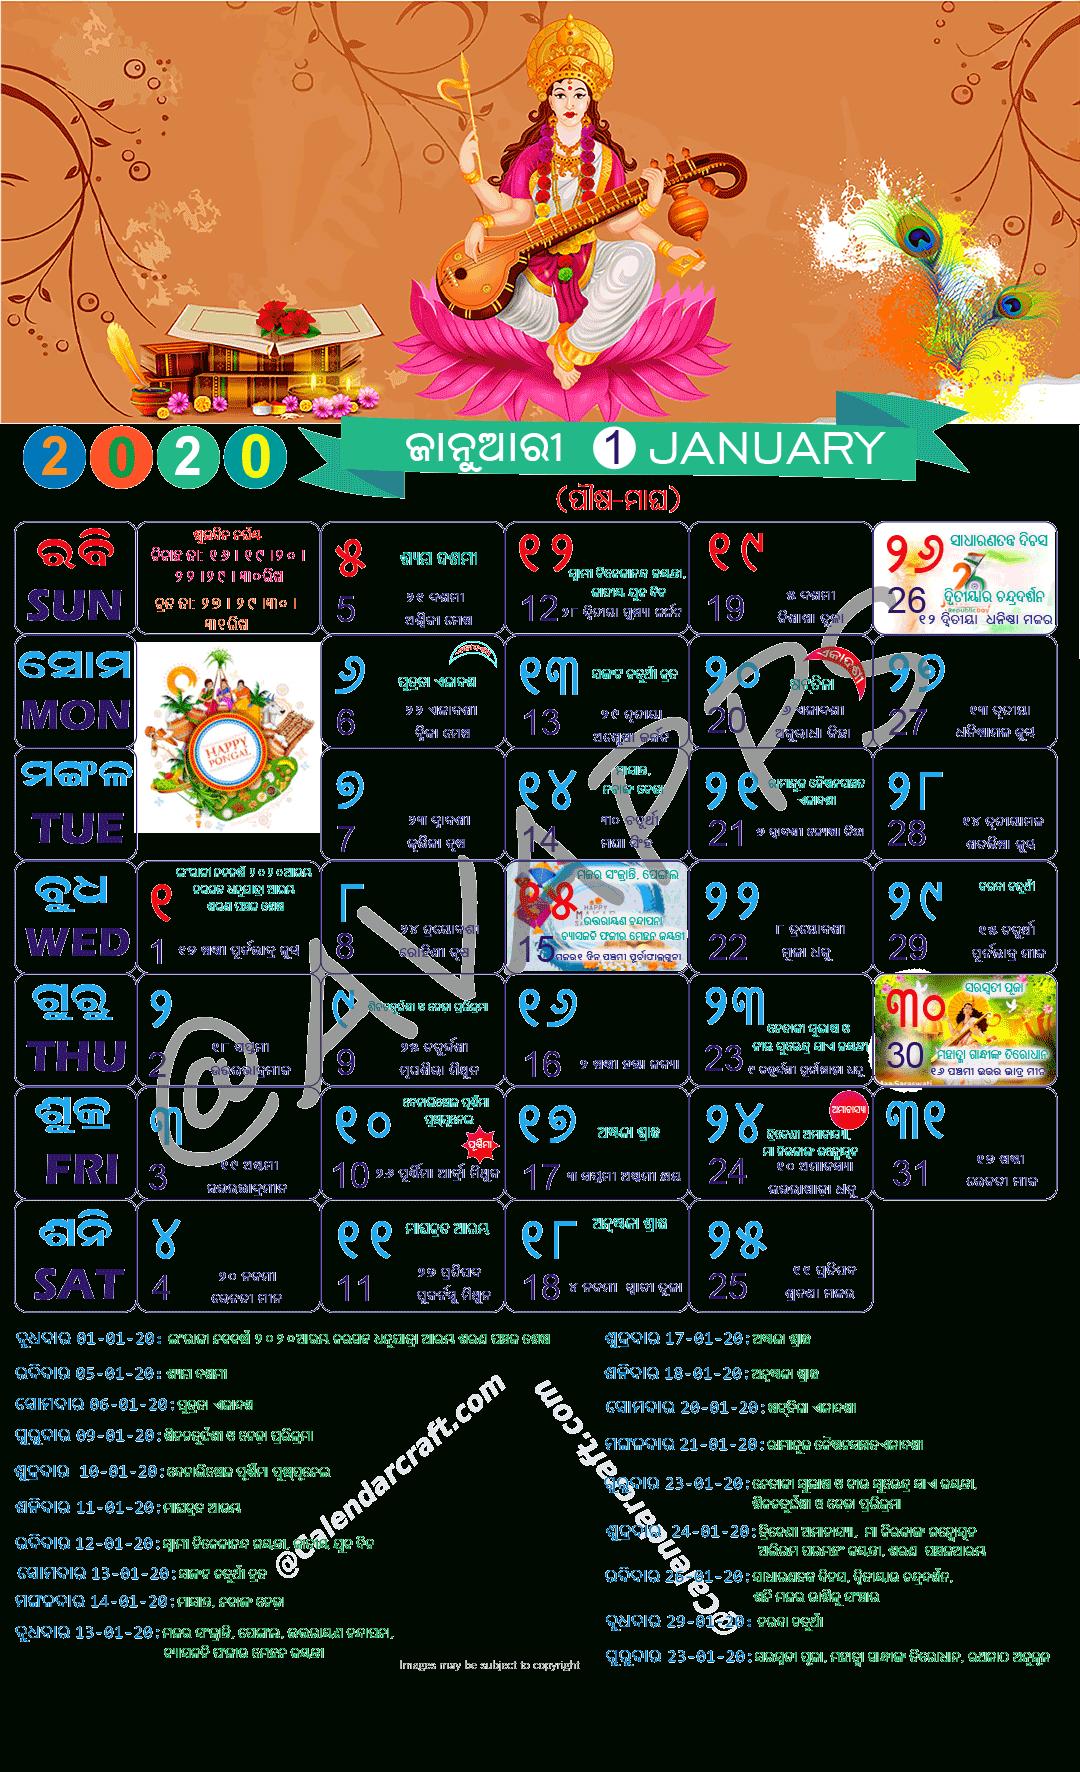 Odia Calendar 2020 Kohinoor Pdf | Seg within 2020 Oriya Calendar